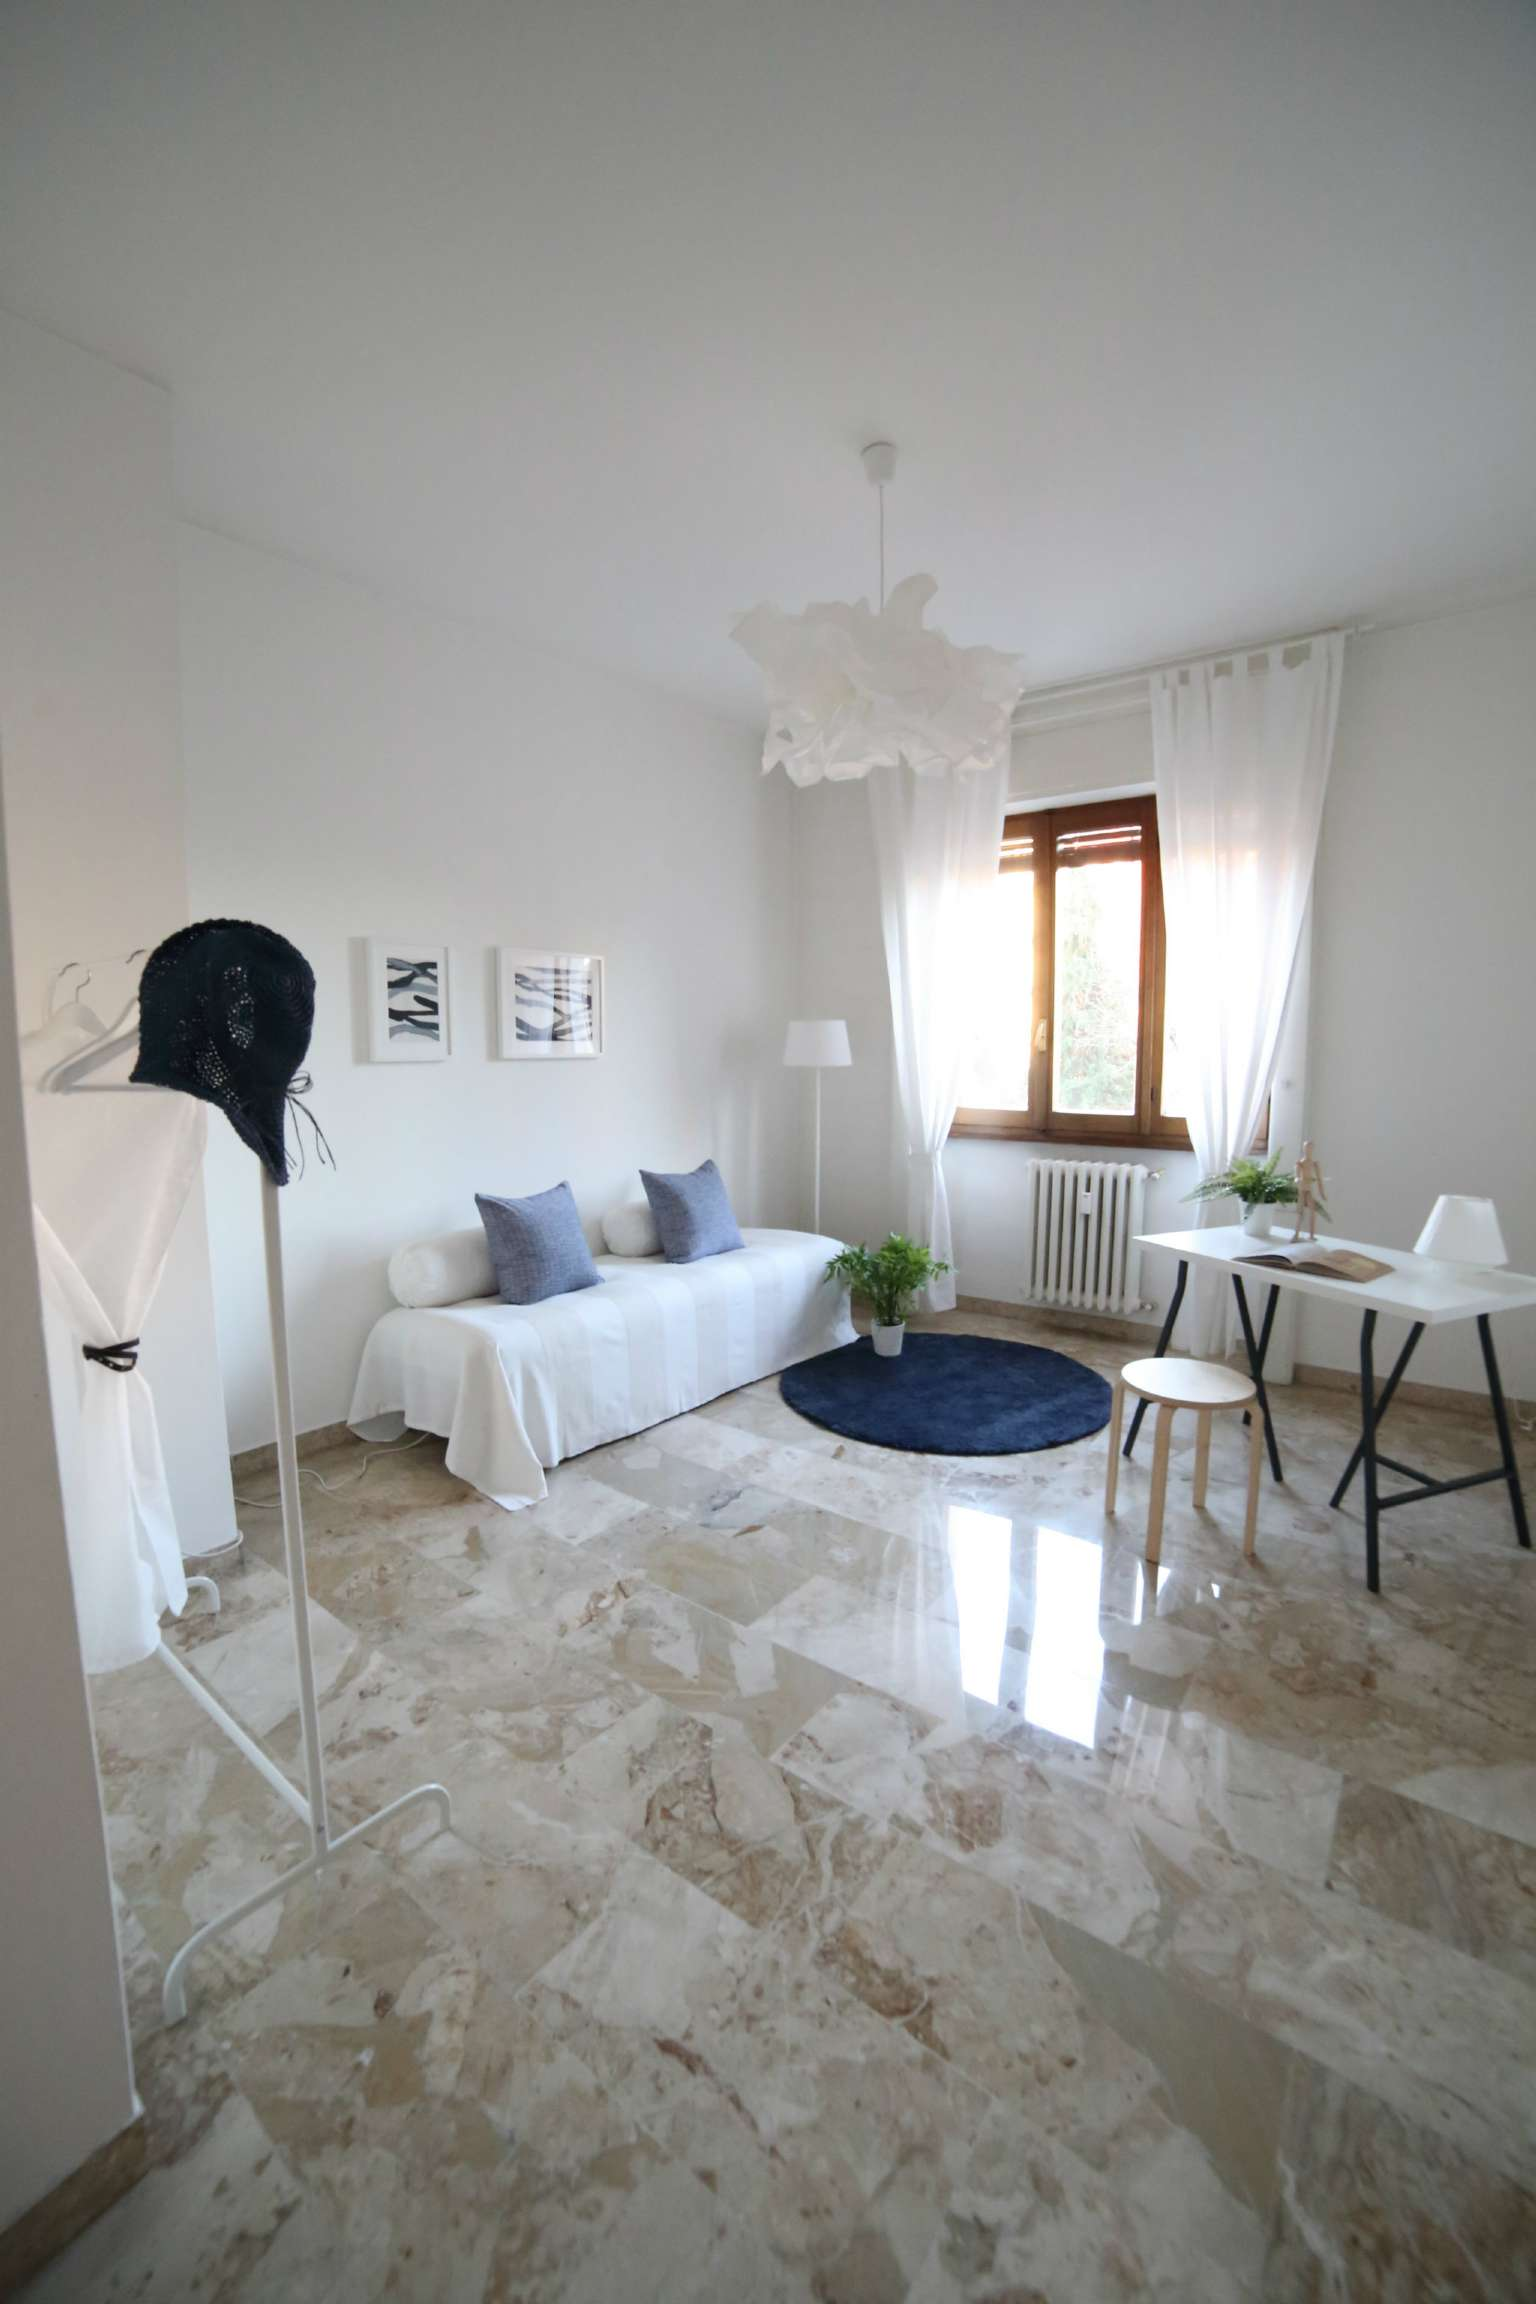 Appartamento quadrilocale in vendita a Varese (VA)